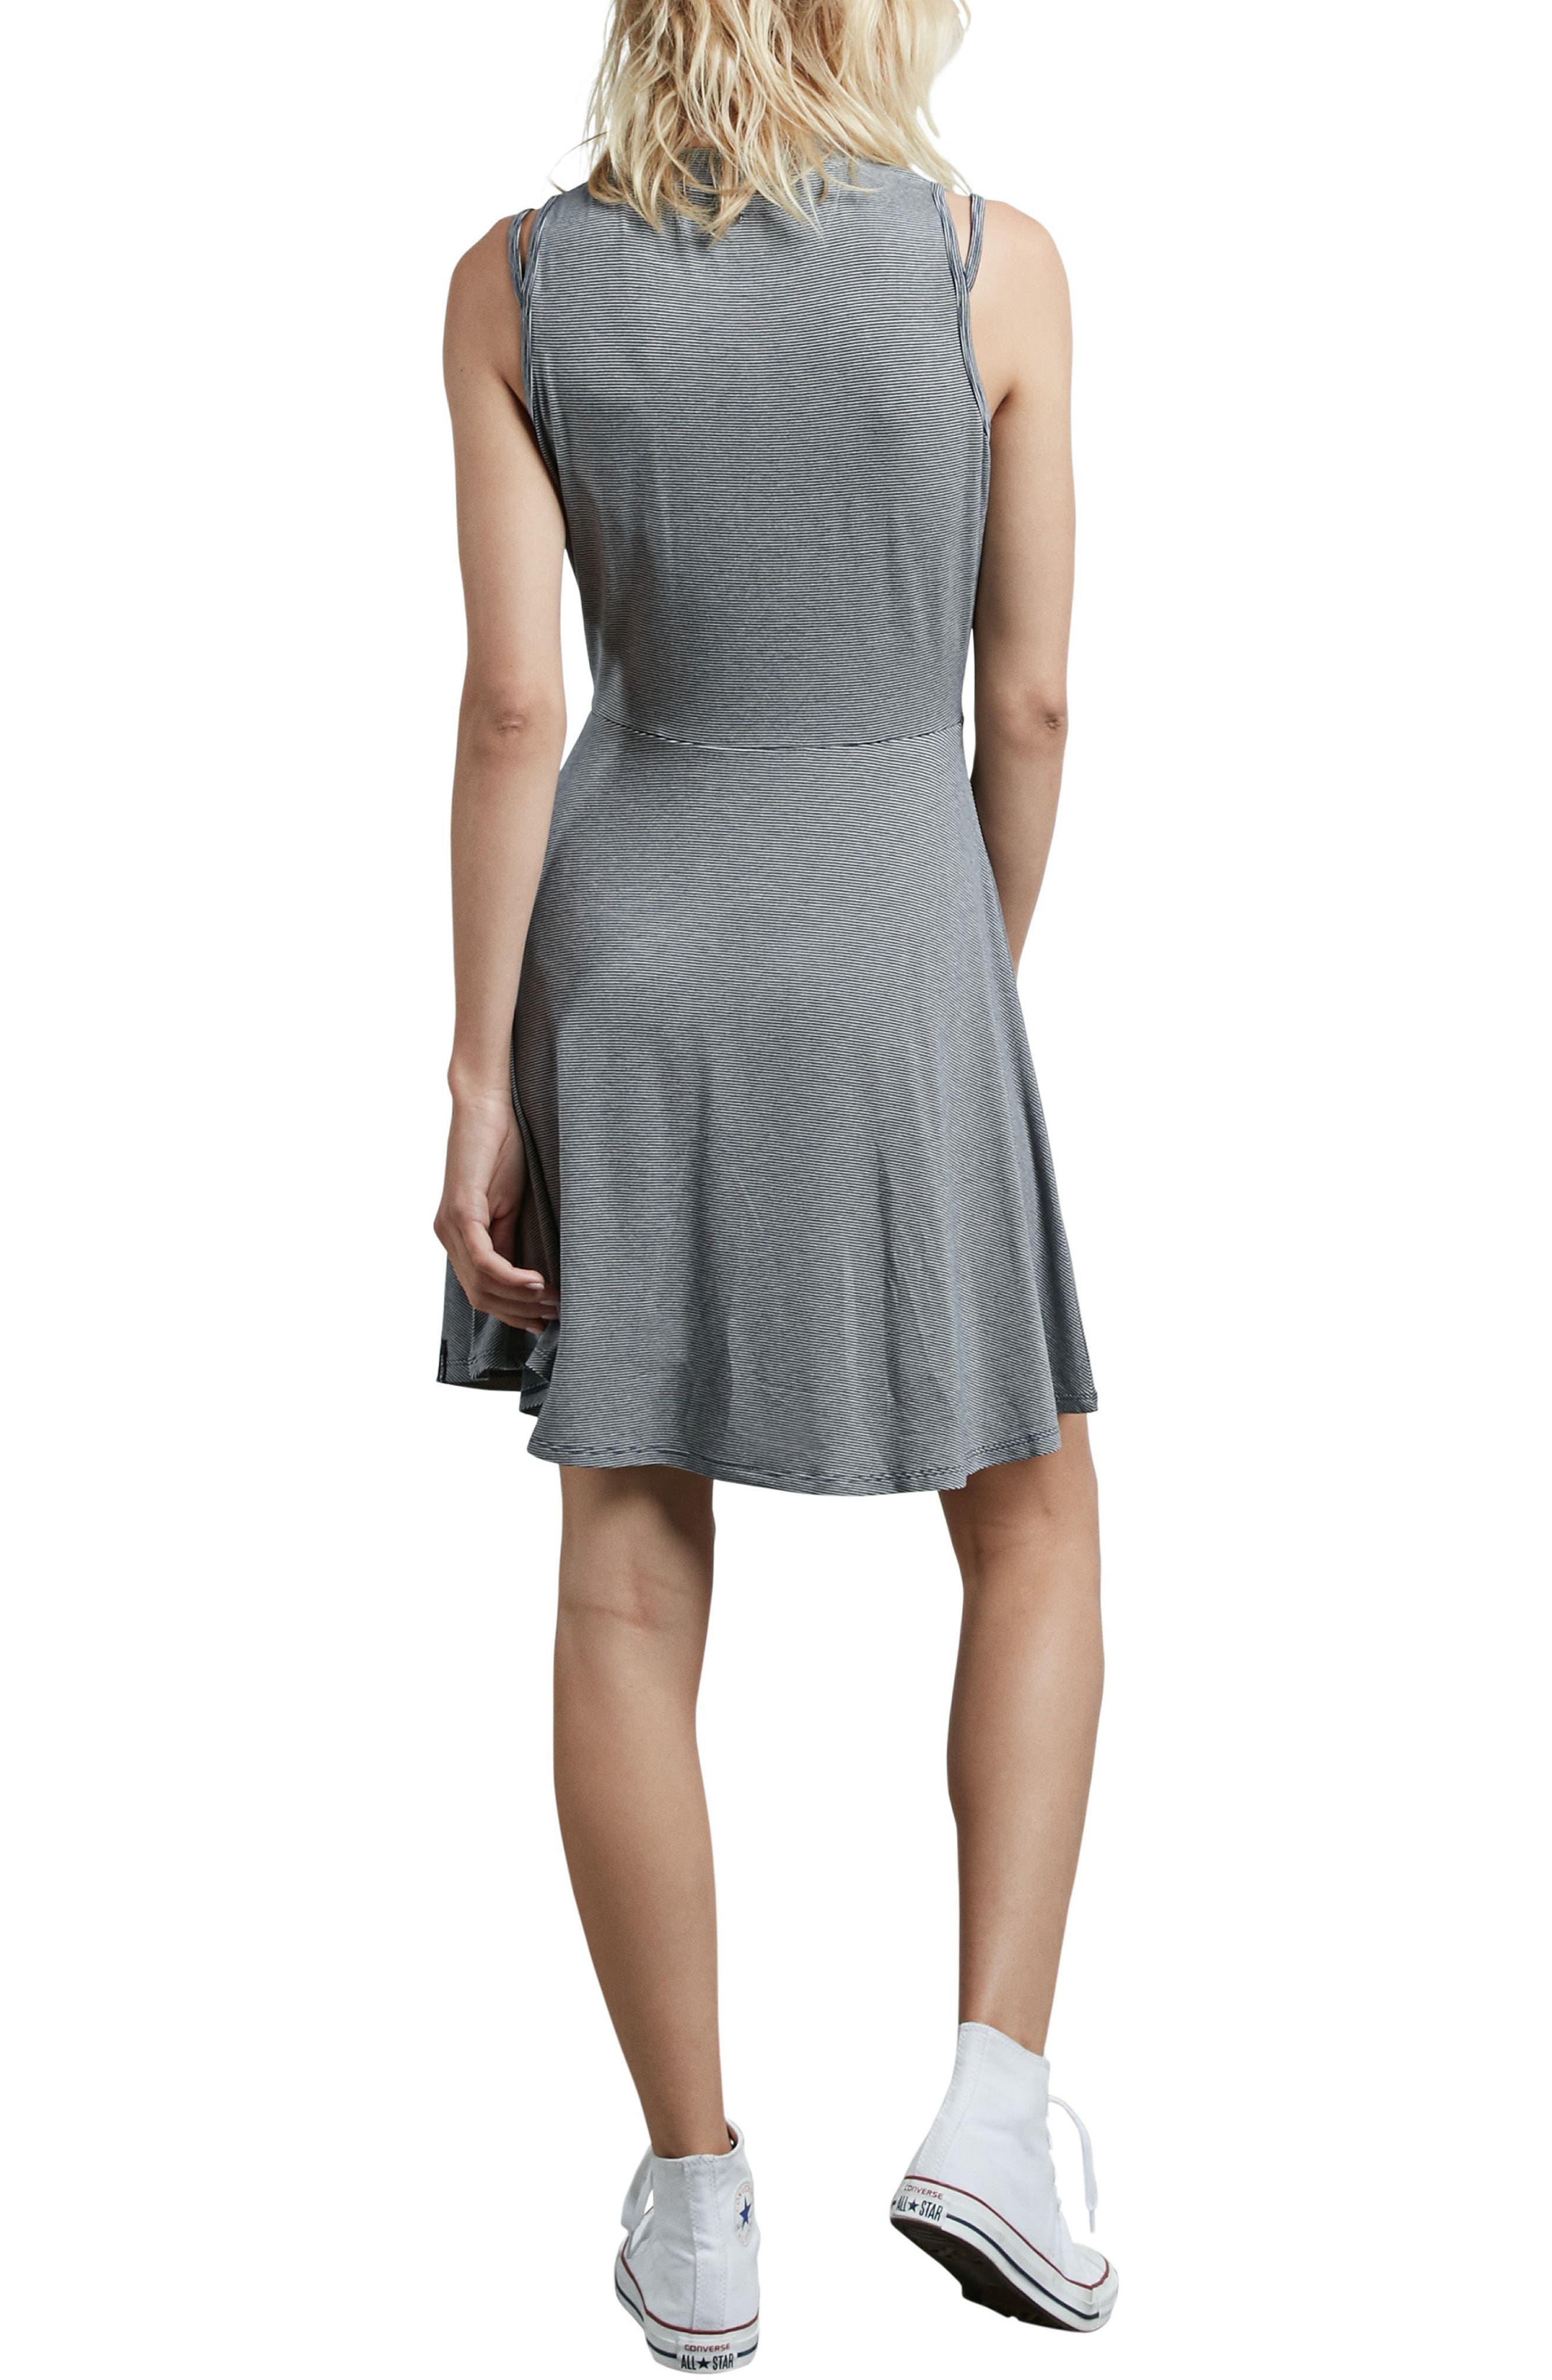 Open Arms Strappy Skater Dress,                             Alternate thumbnail 2, color,                             Navy Vnt